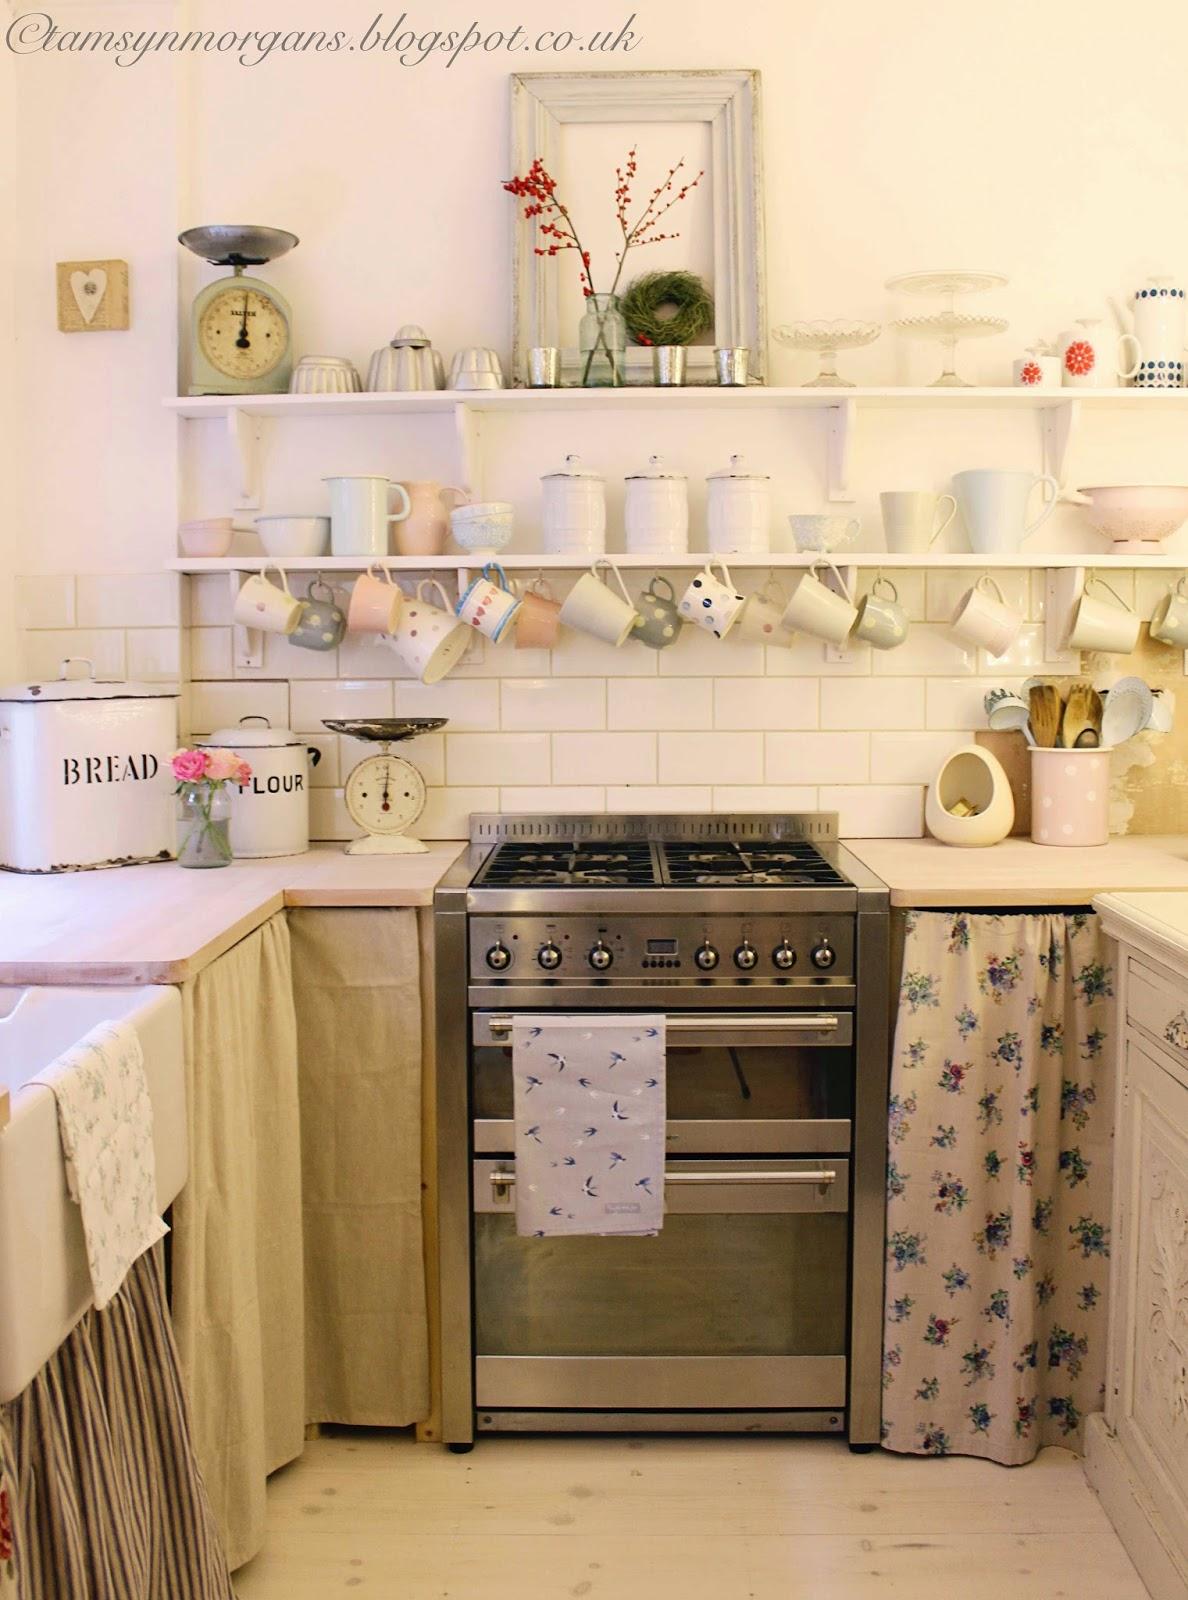 Kitchen Reveal - A Work In Progress - The Villa on Mount ...